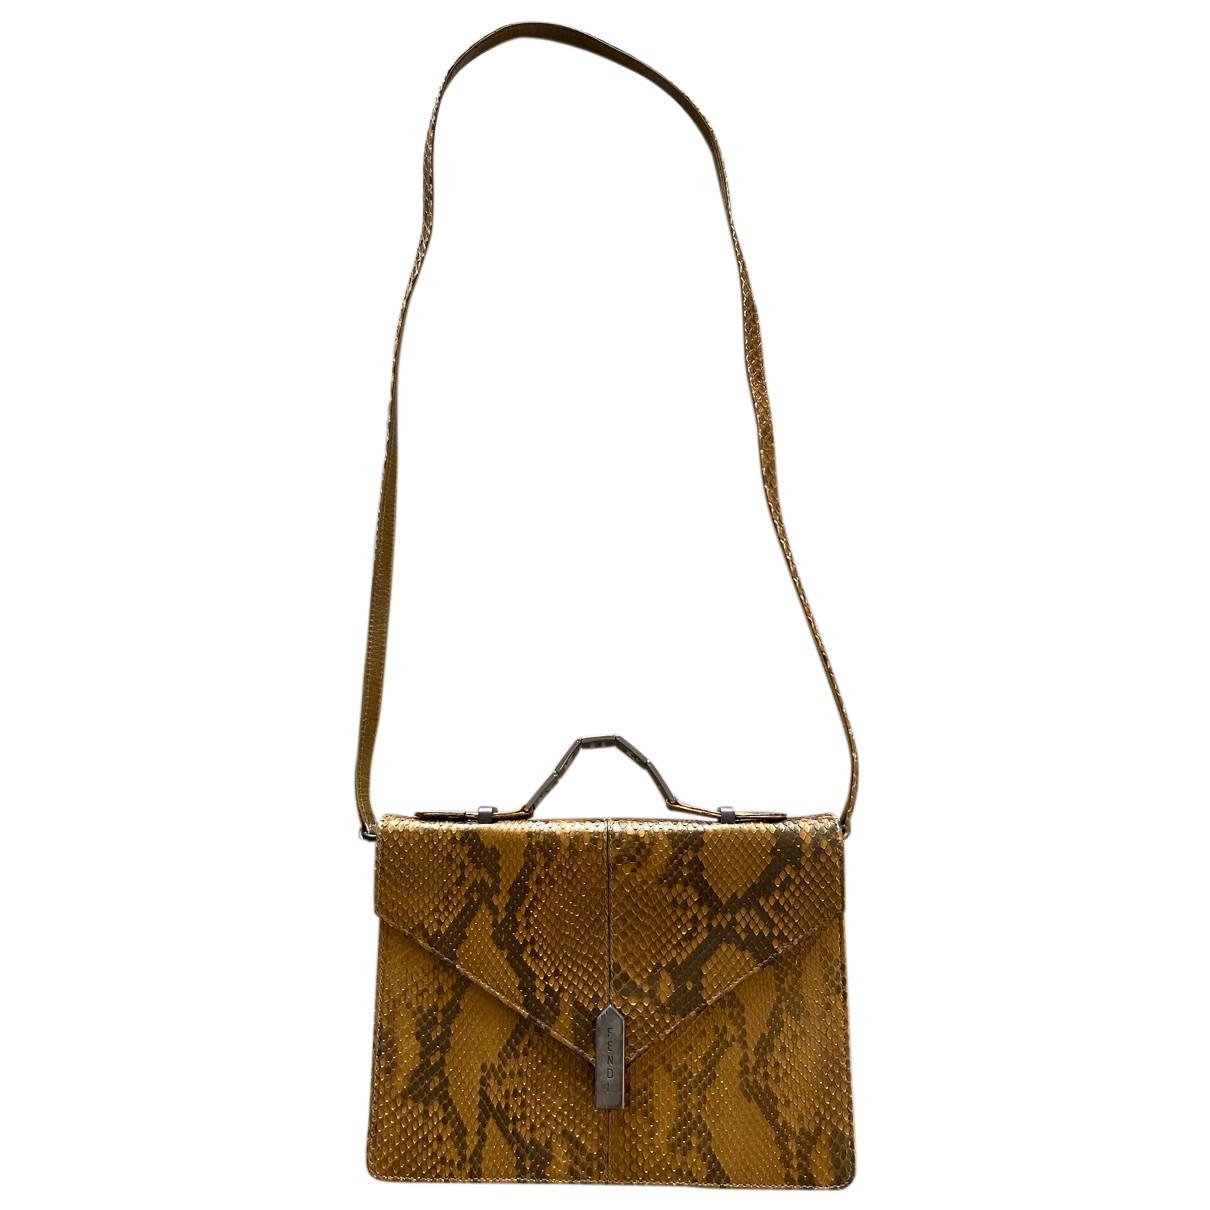 Fendi N Brown Python handbag for Women N